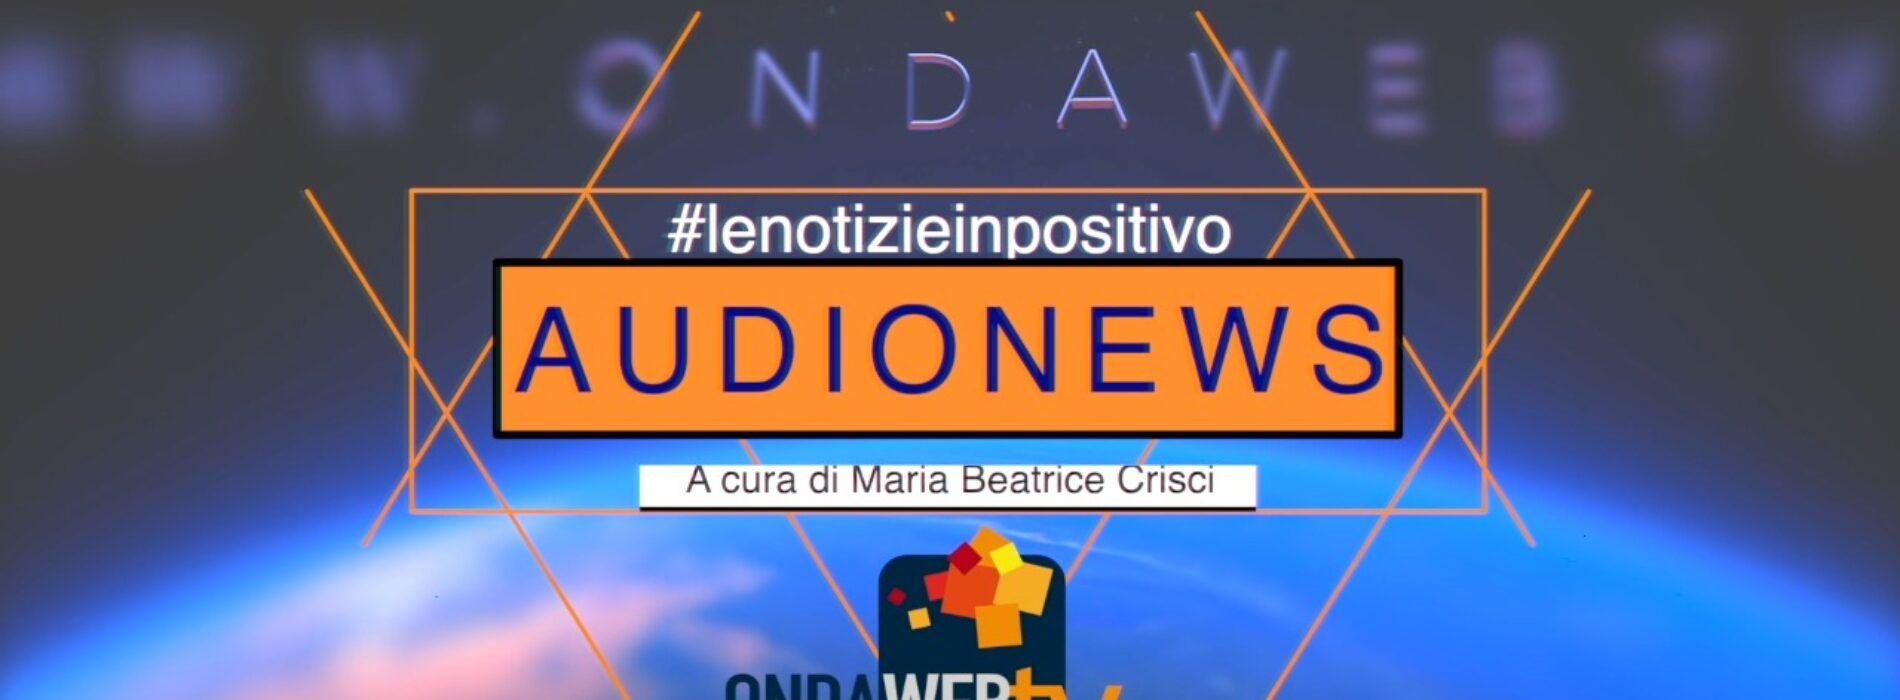 Audionews di Ondawebtv. 30 gennaio